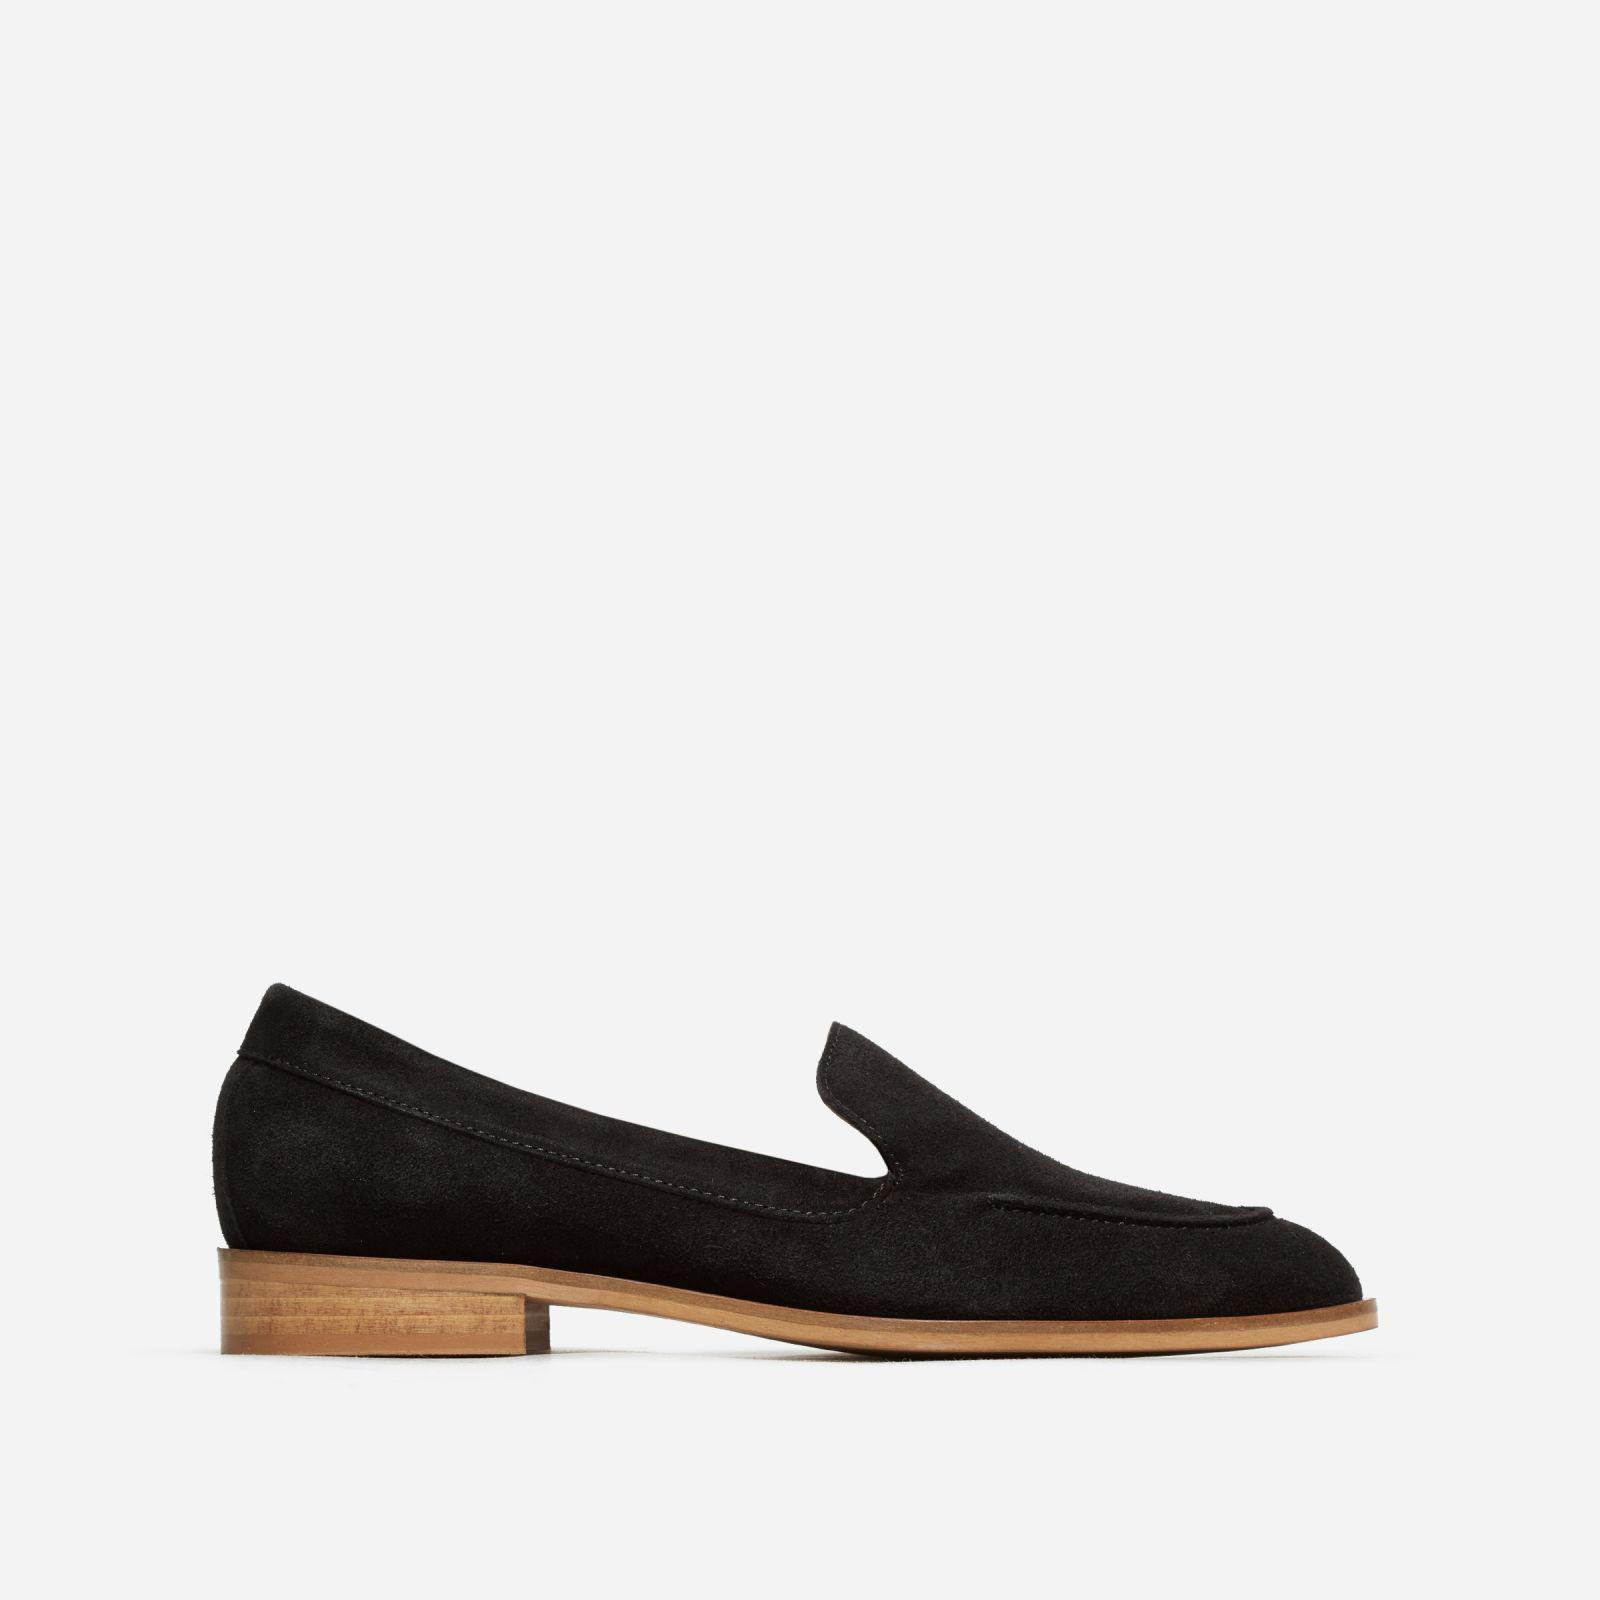 f198c545f3e Lyst - Everlane The Modern Loafer in Black